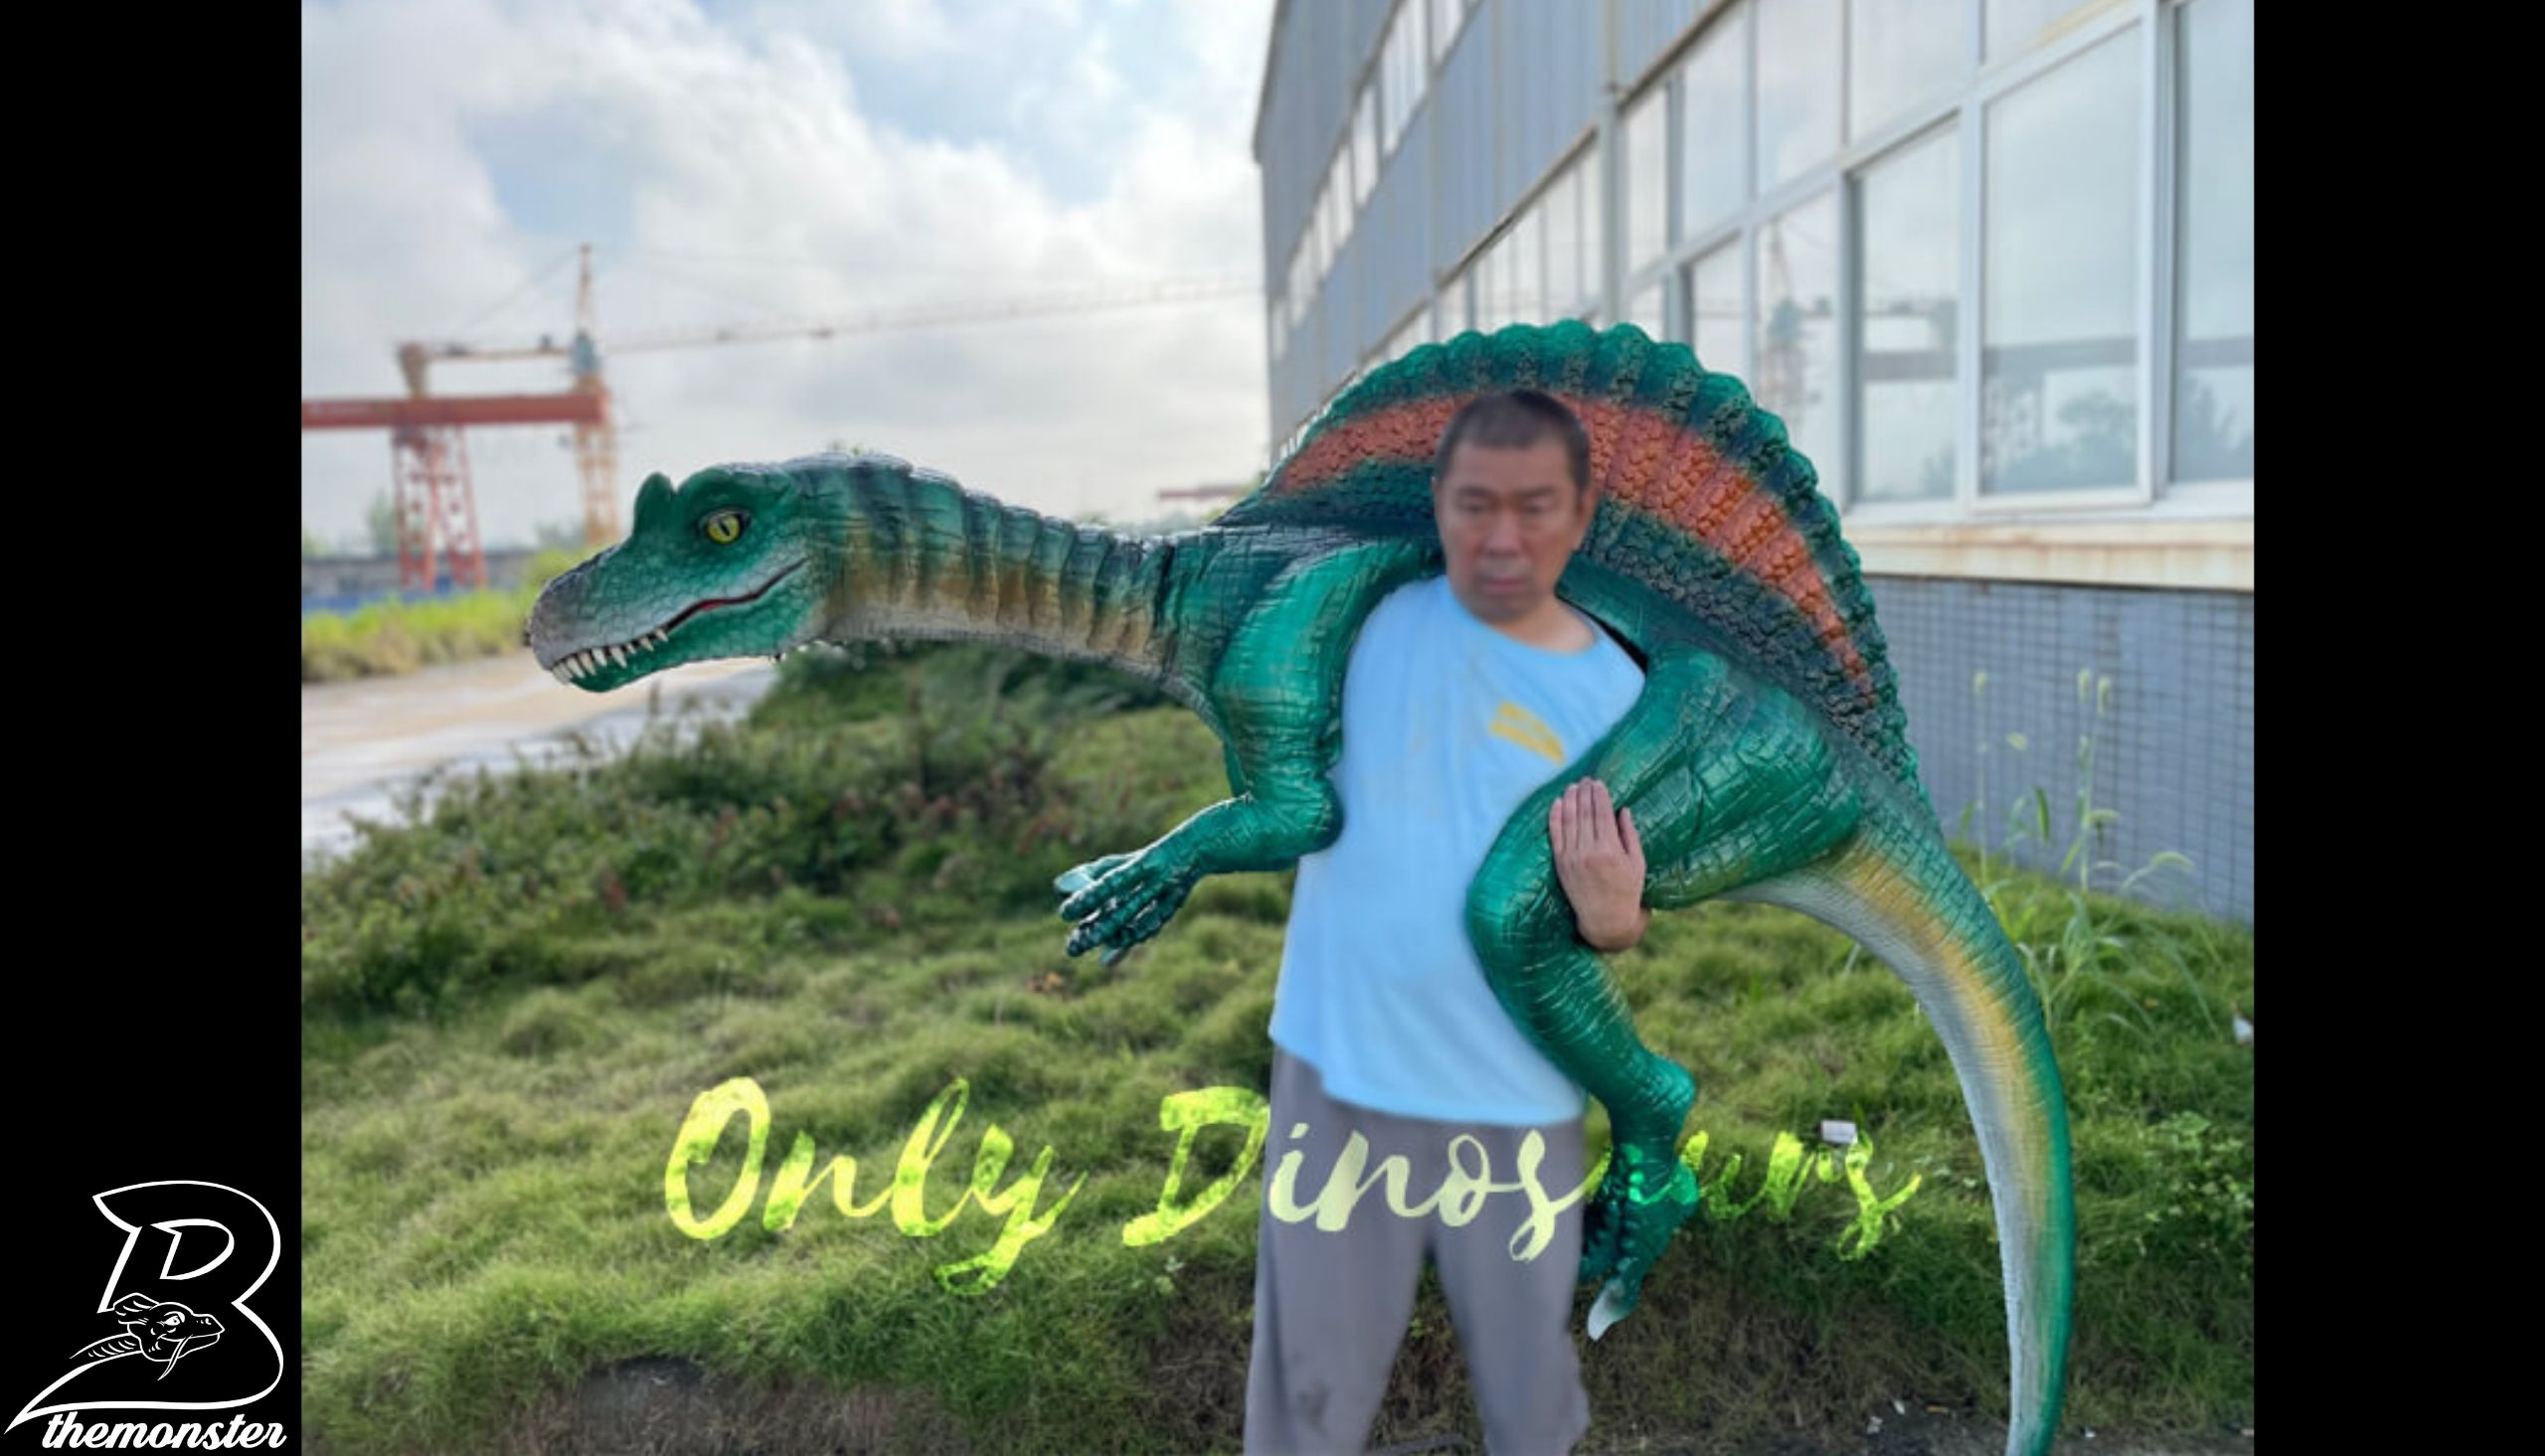 Colorful Spinosaurus Shoulder Puppet in vendita sul Bthemonster.com